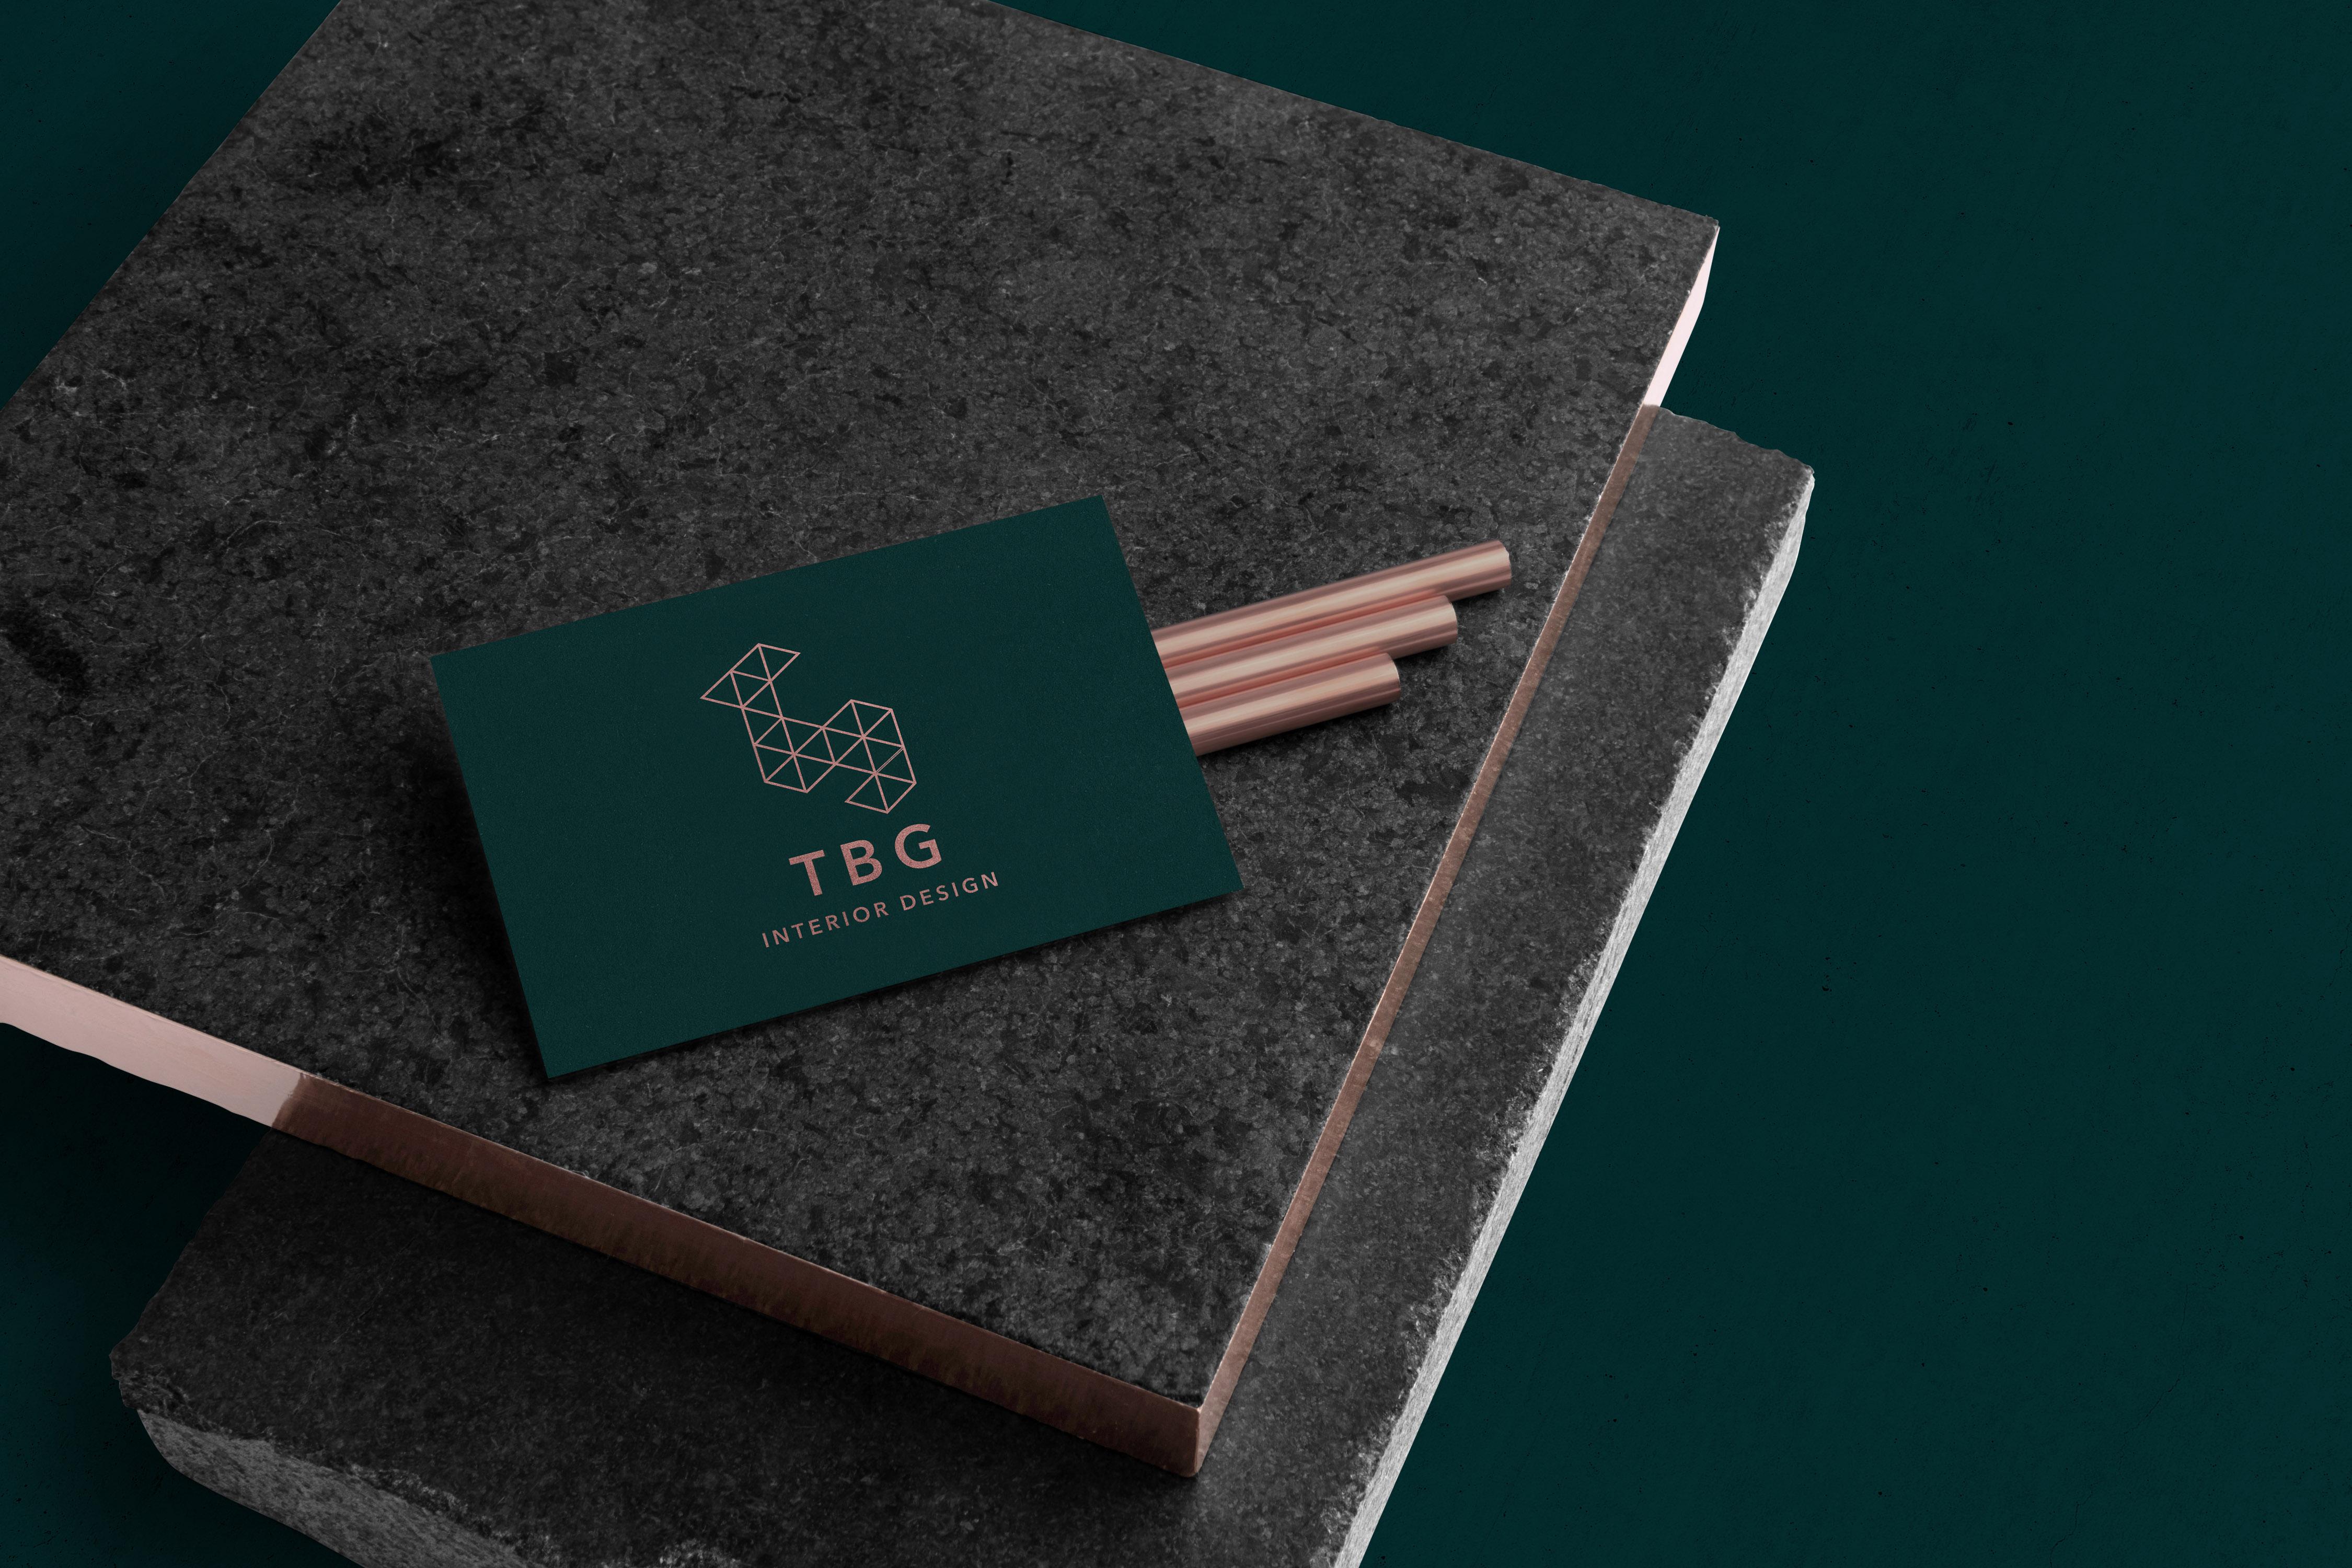 A Fresh New Look | TBG Interior Design undergoes new creative rebranding